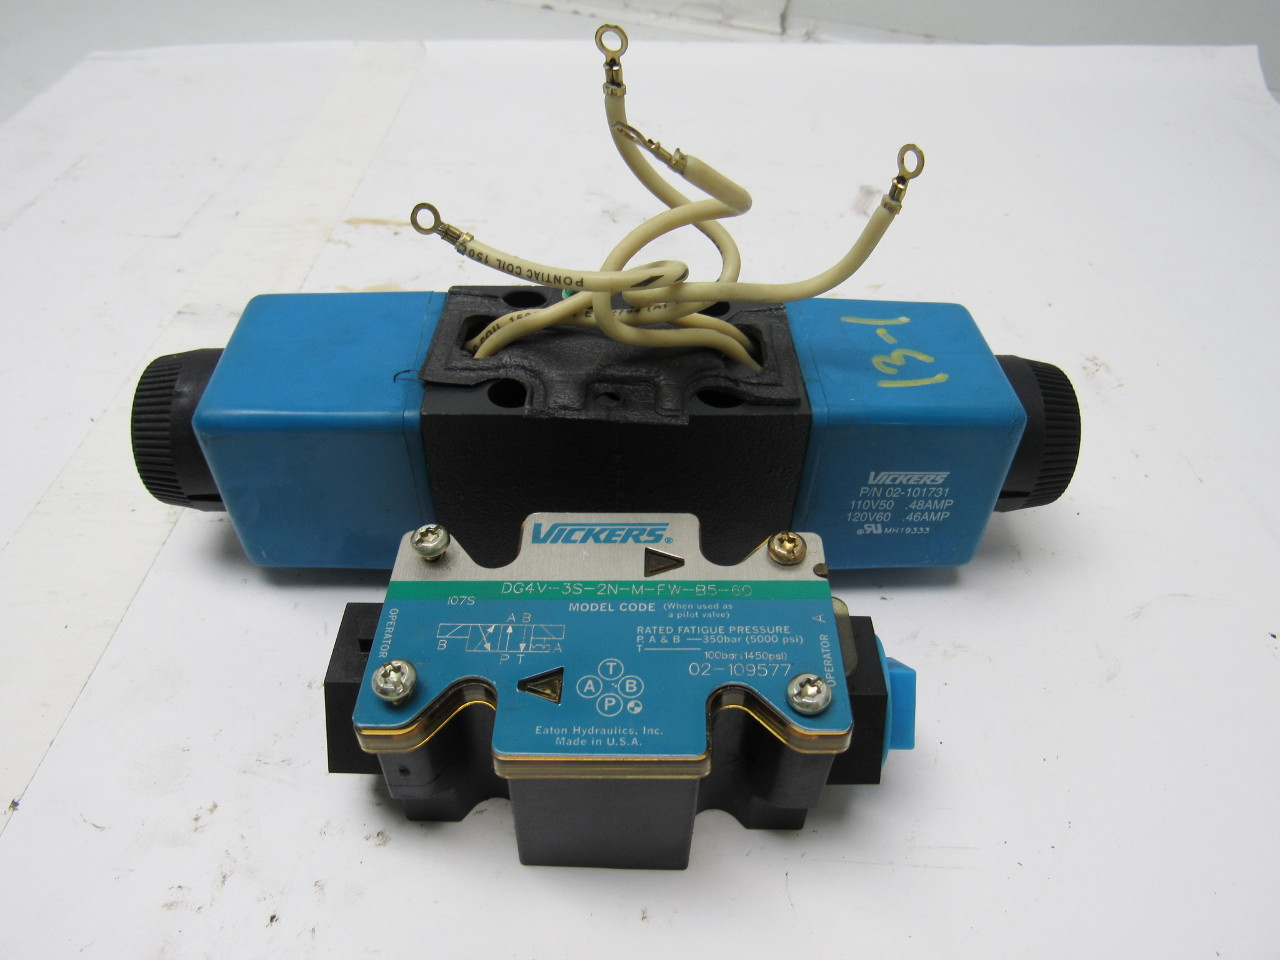 Vickers 02-109577 DG4V-3S-2N-M-FW-B5-60 Hydraulic Directional Control Valve